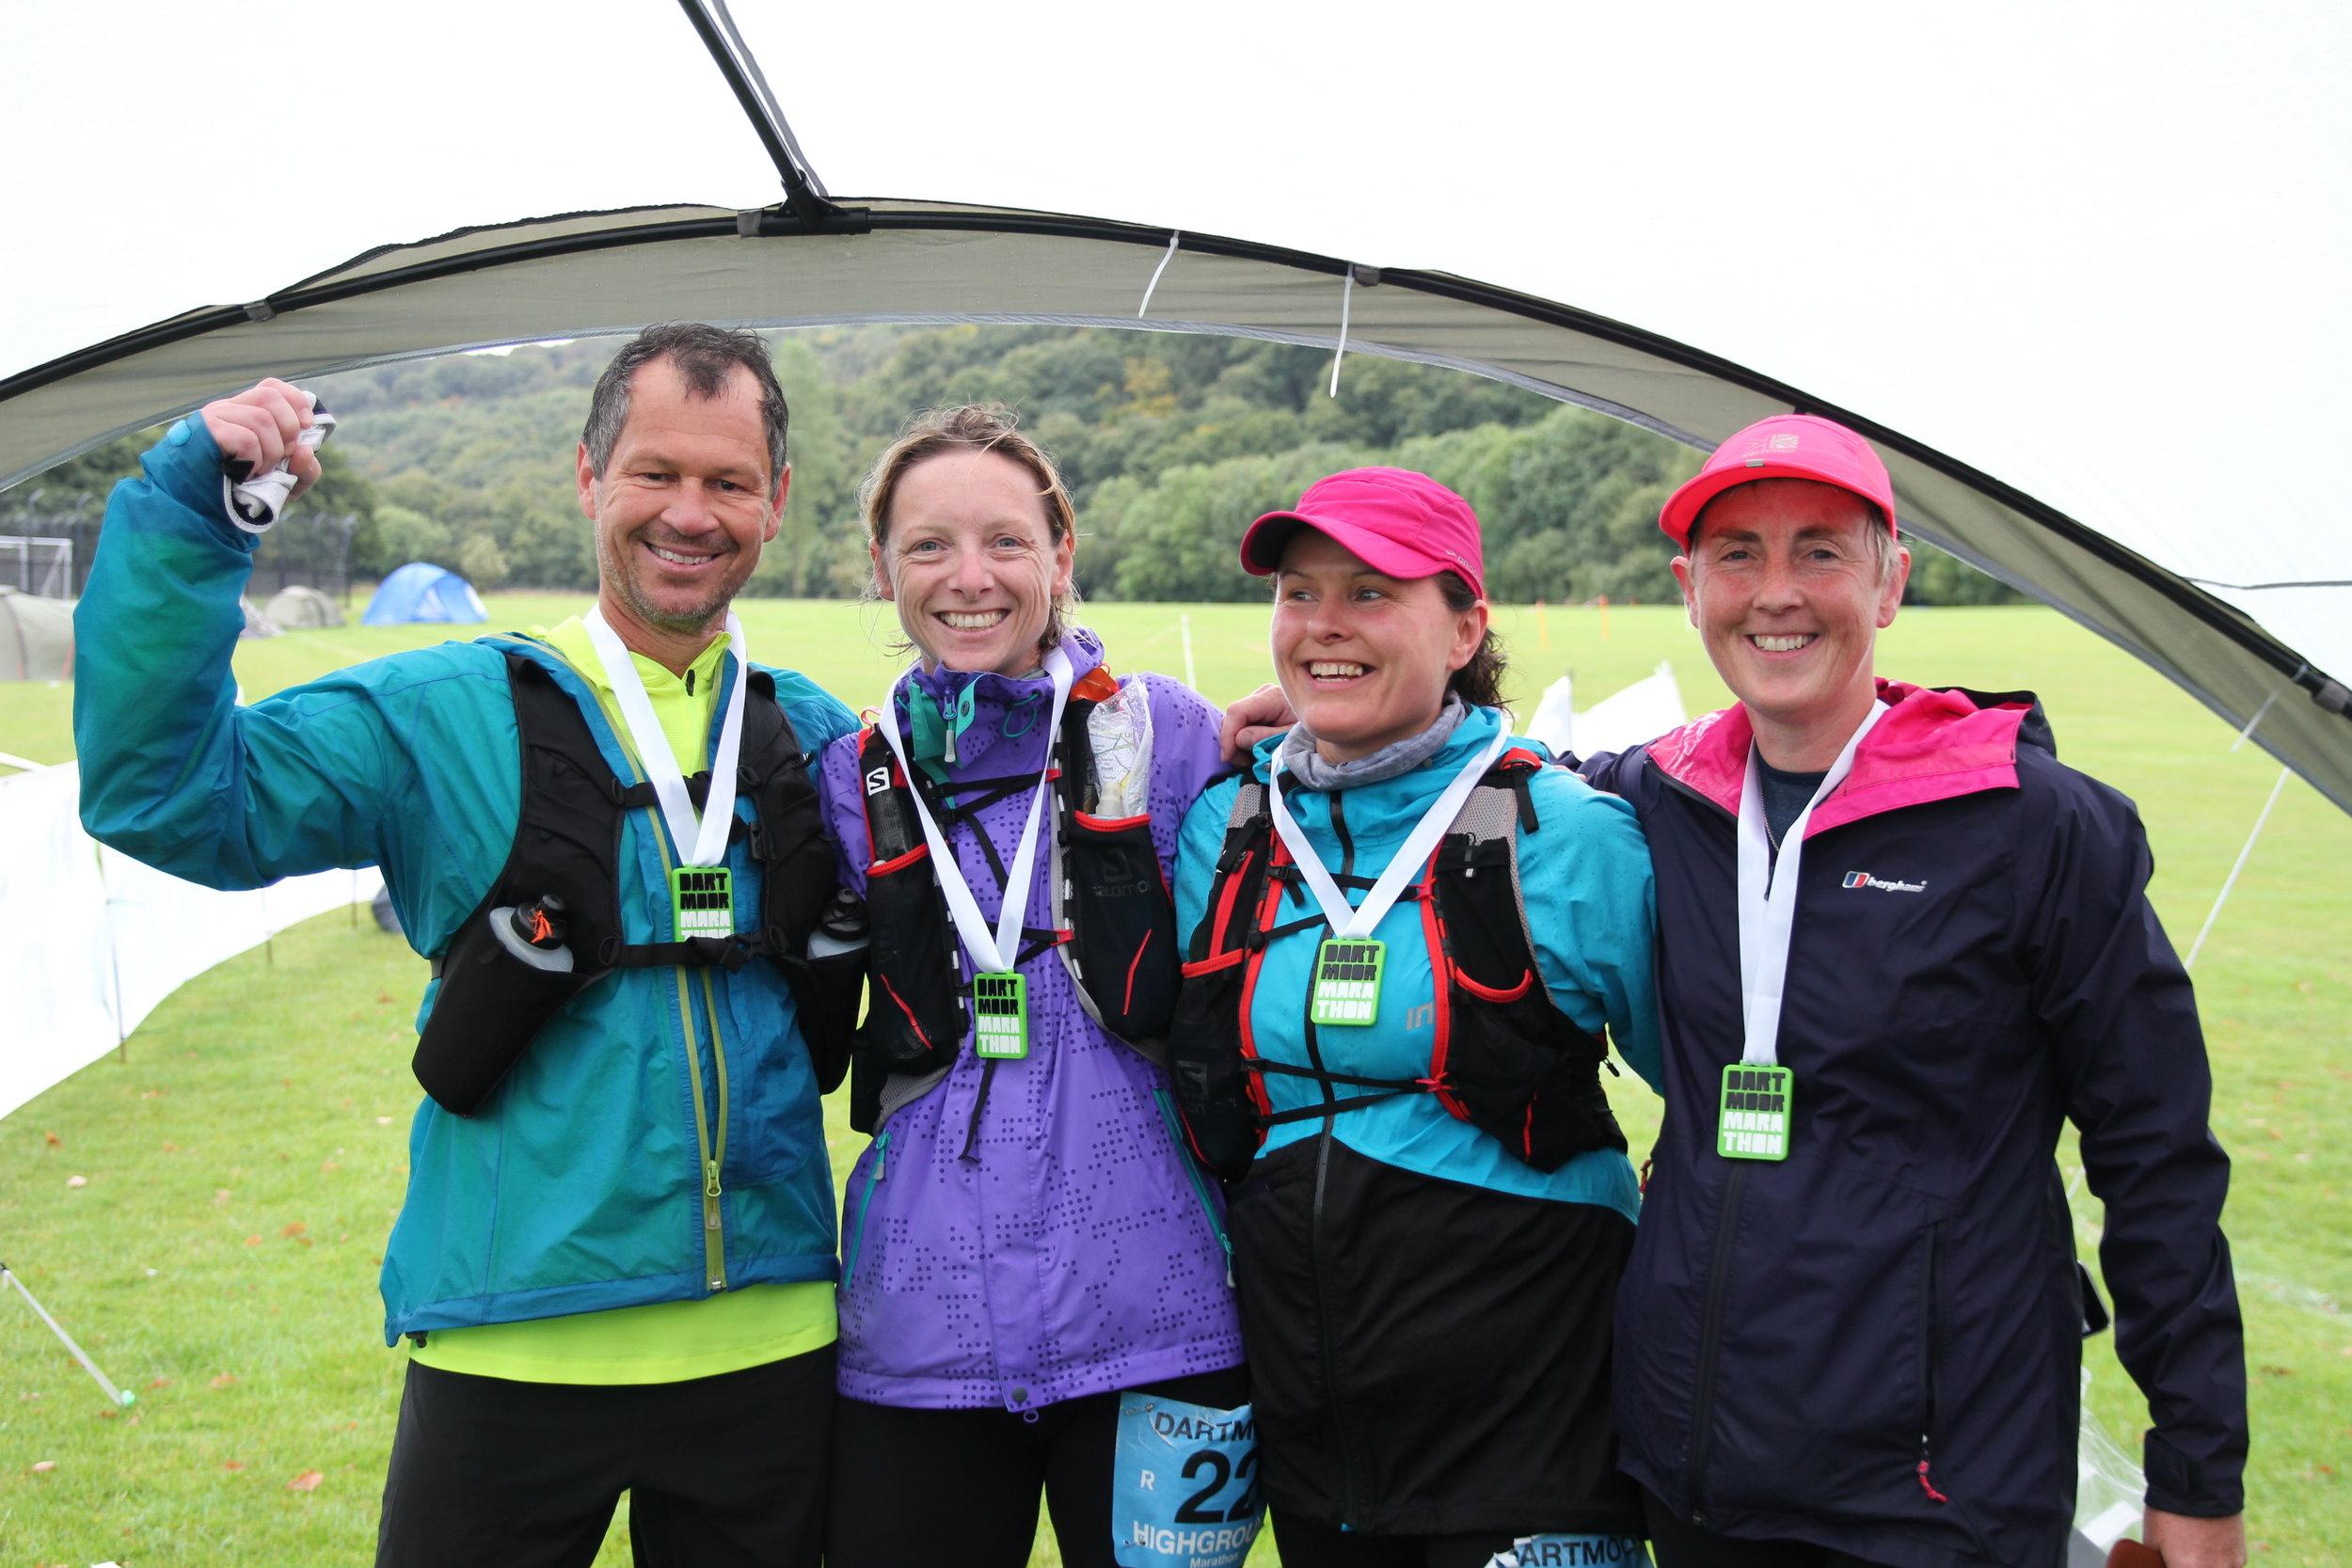 Finished the Dartmoor Marathon